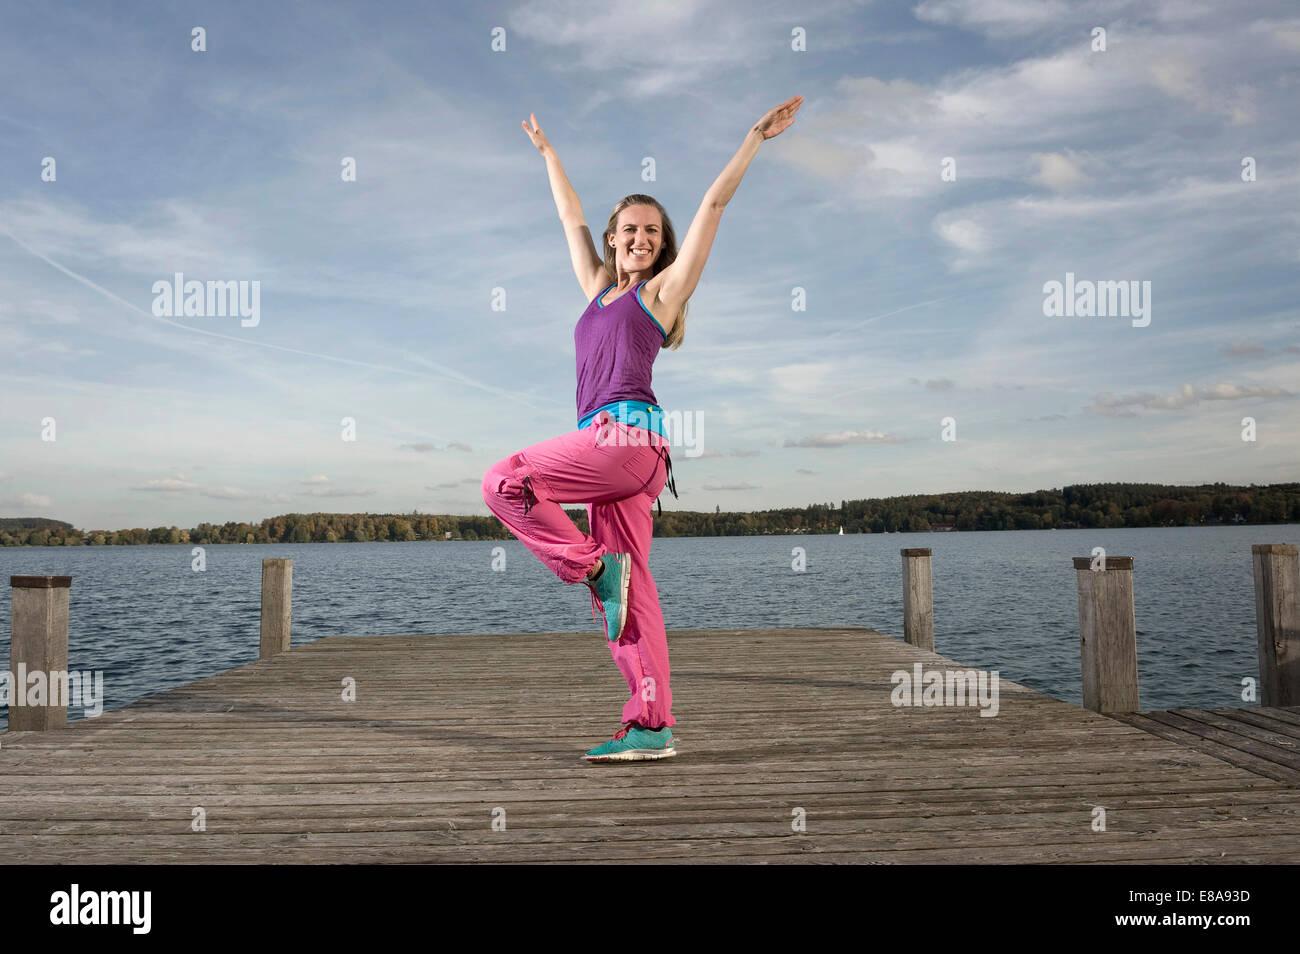 Woman dancing Zumba on jetty, Woerthsee, Bavaria, Germany - Stock Image